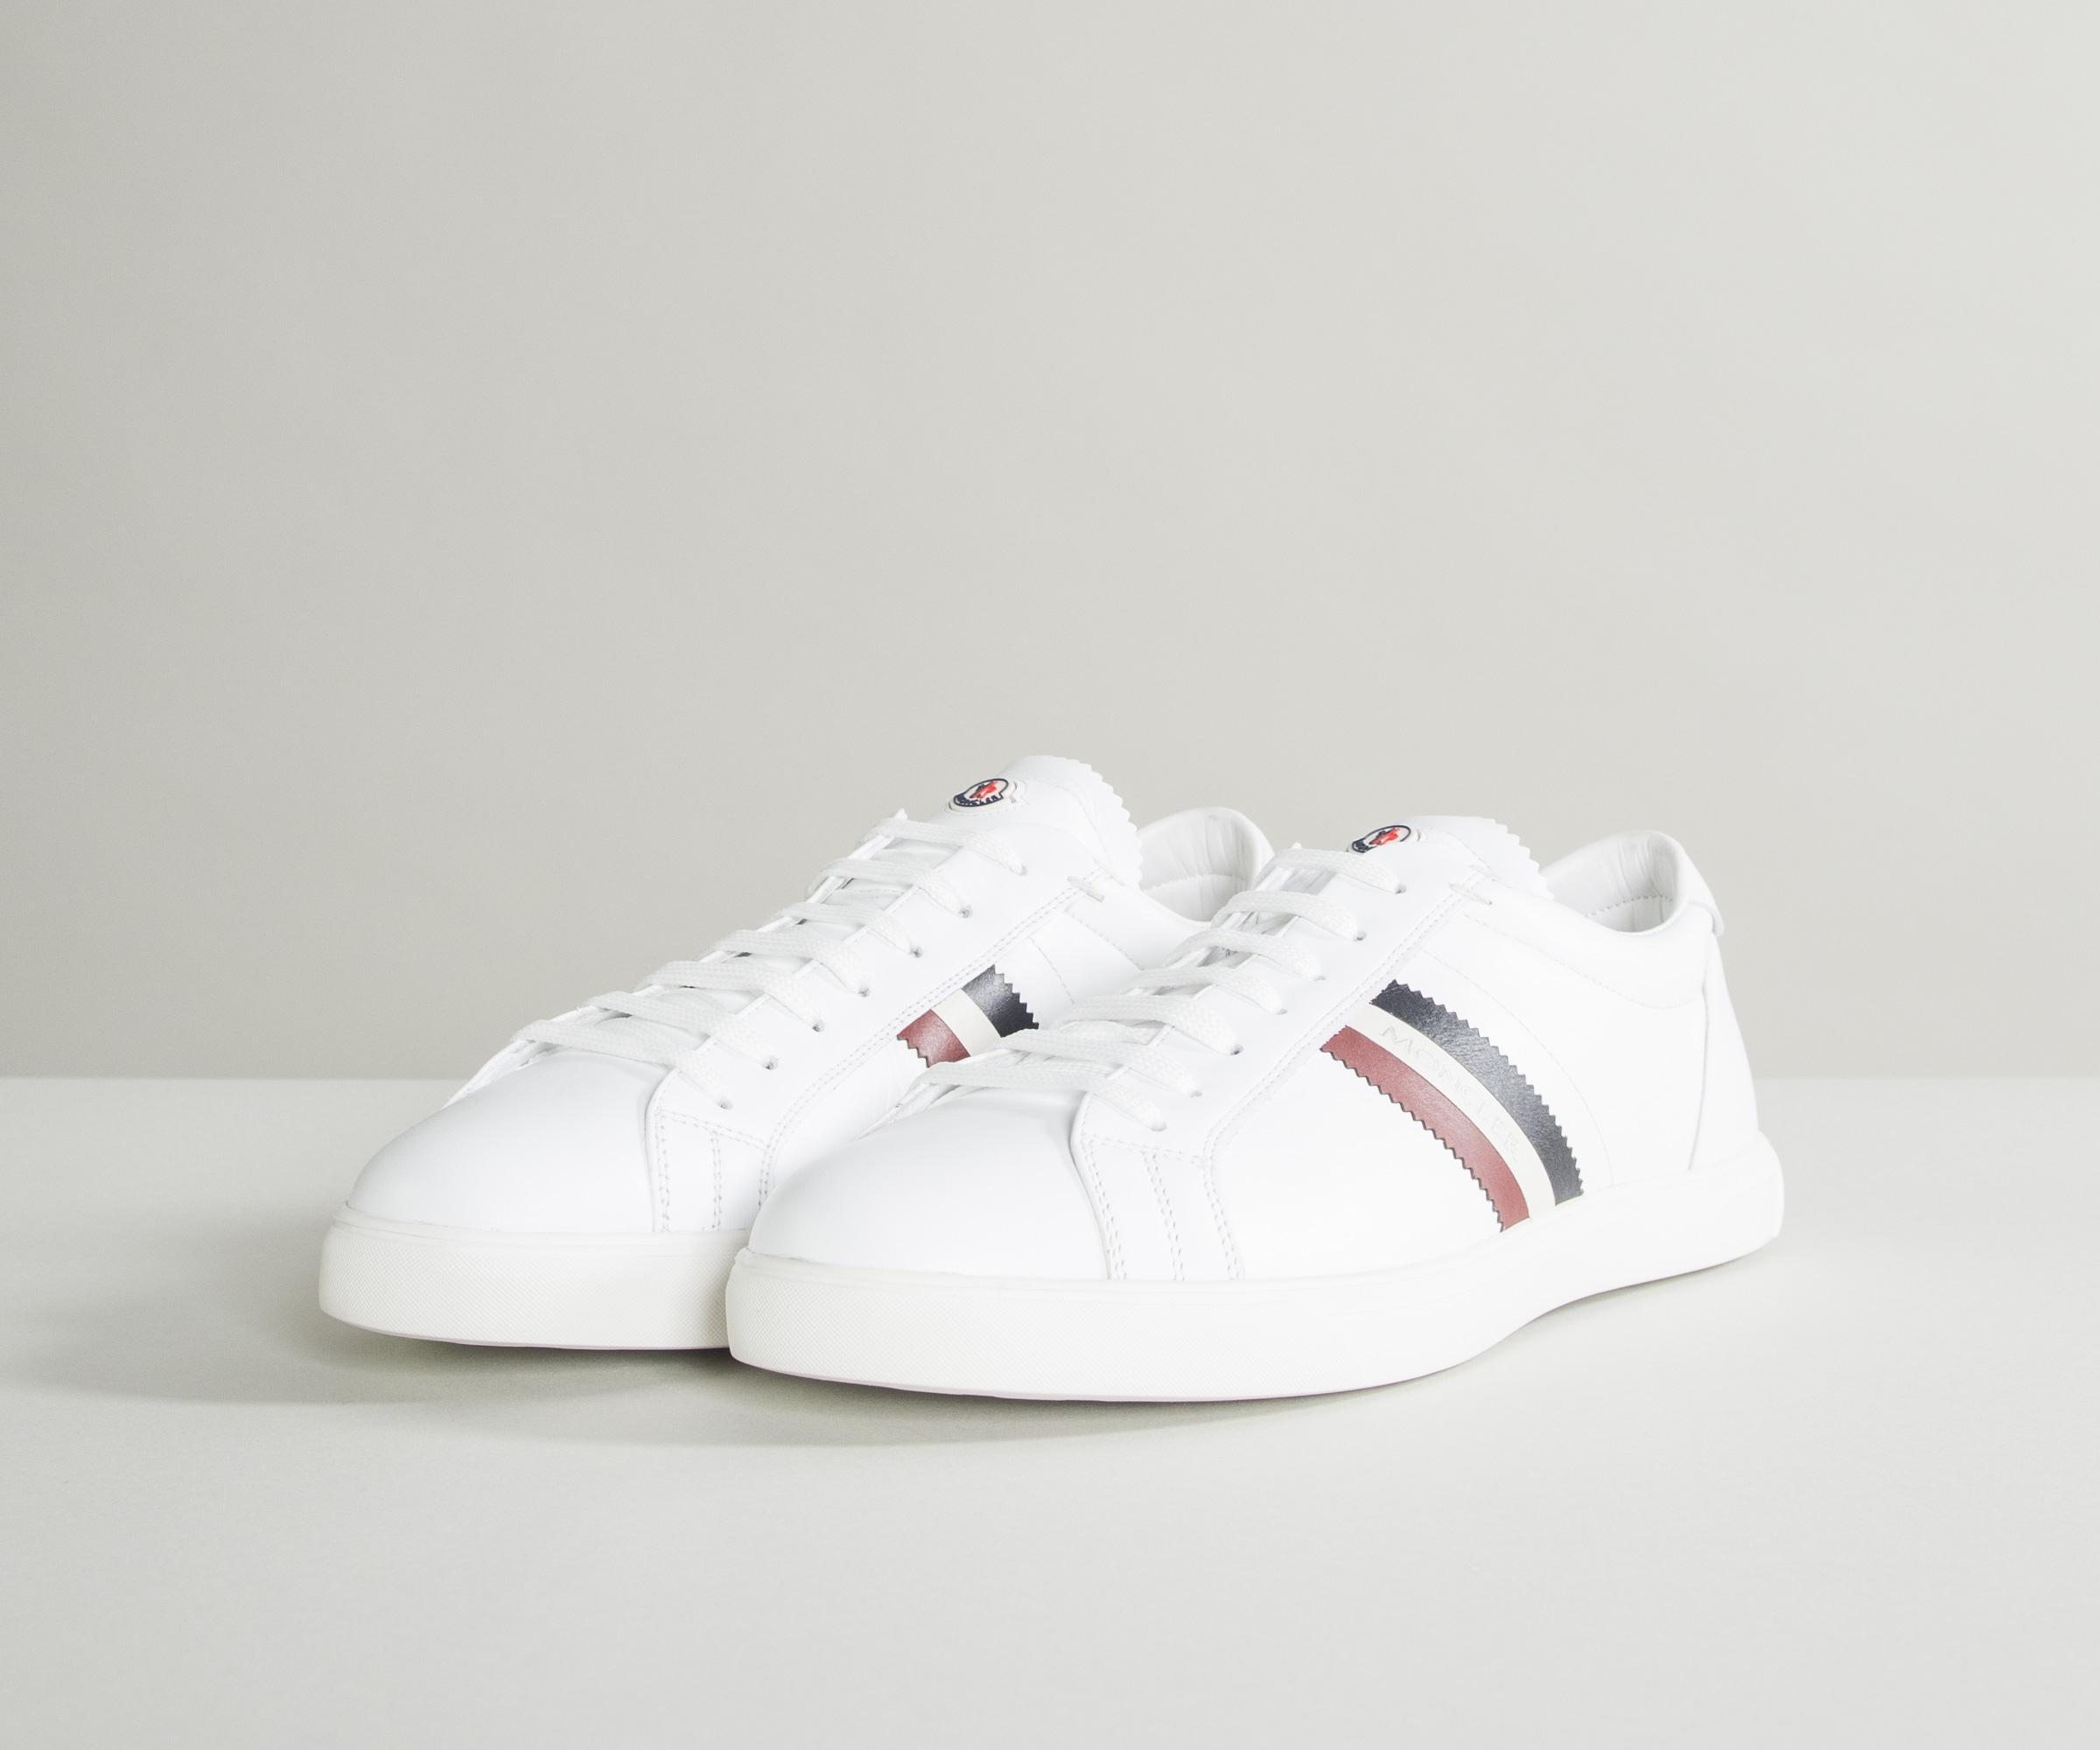 bf7de7393 Lyst - Moncler  la Monaco  Trainers With Trim White in White for Men ...